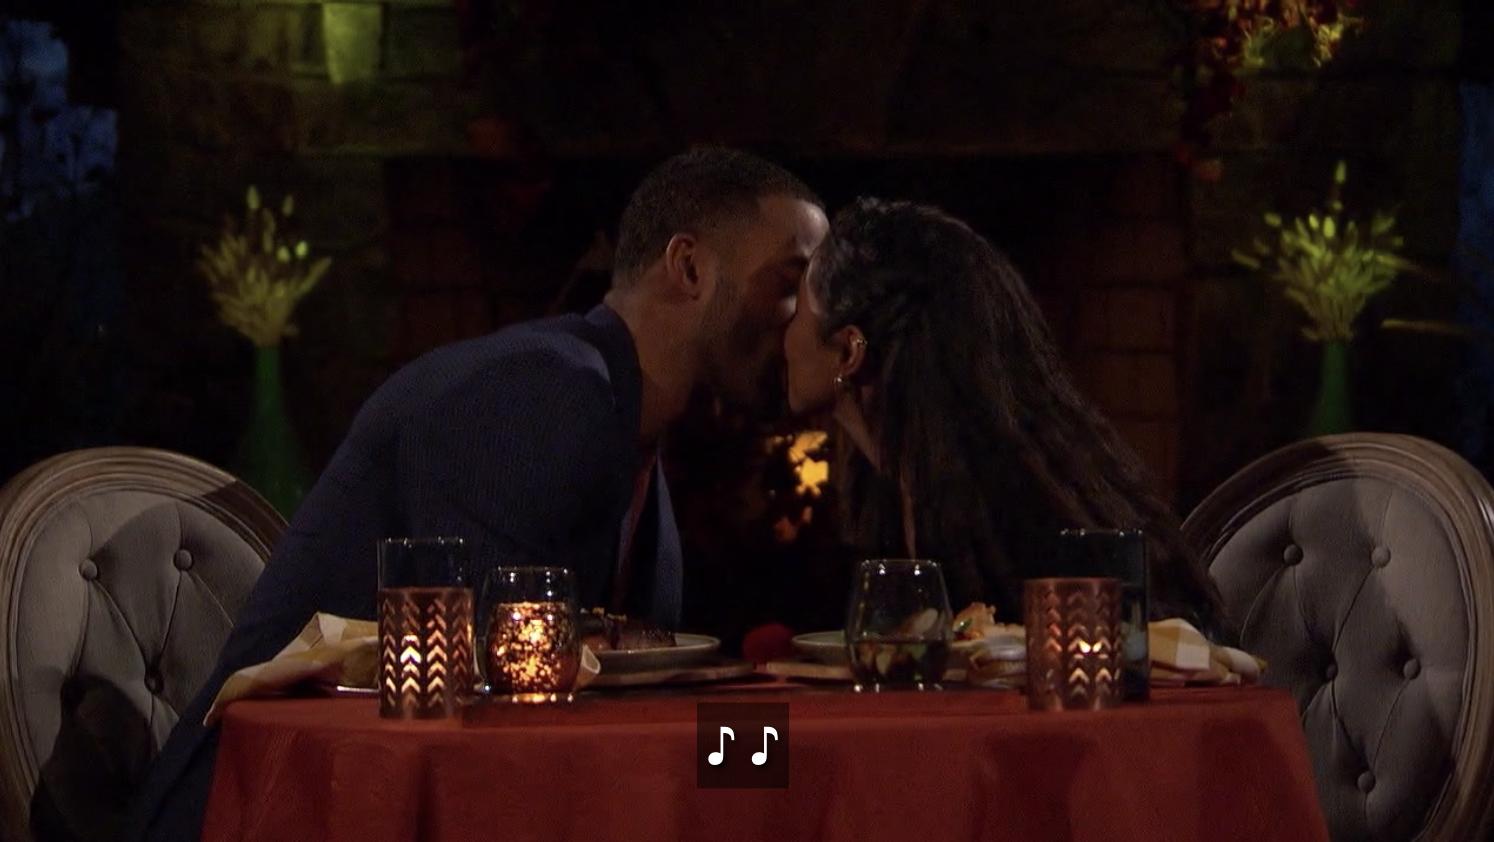 Matt and Bri kissing on their date